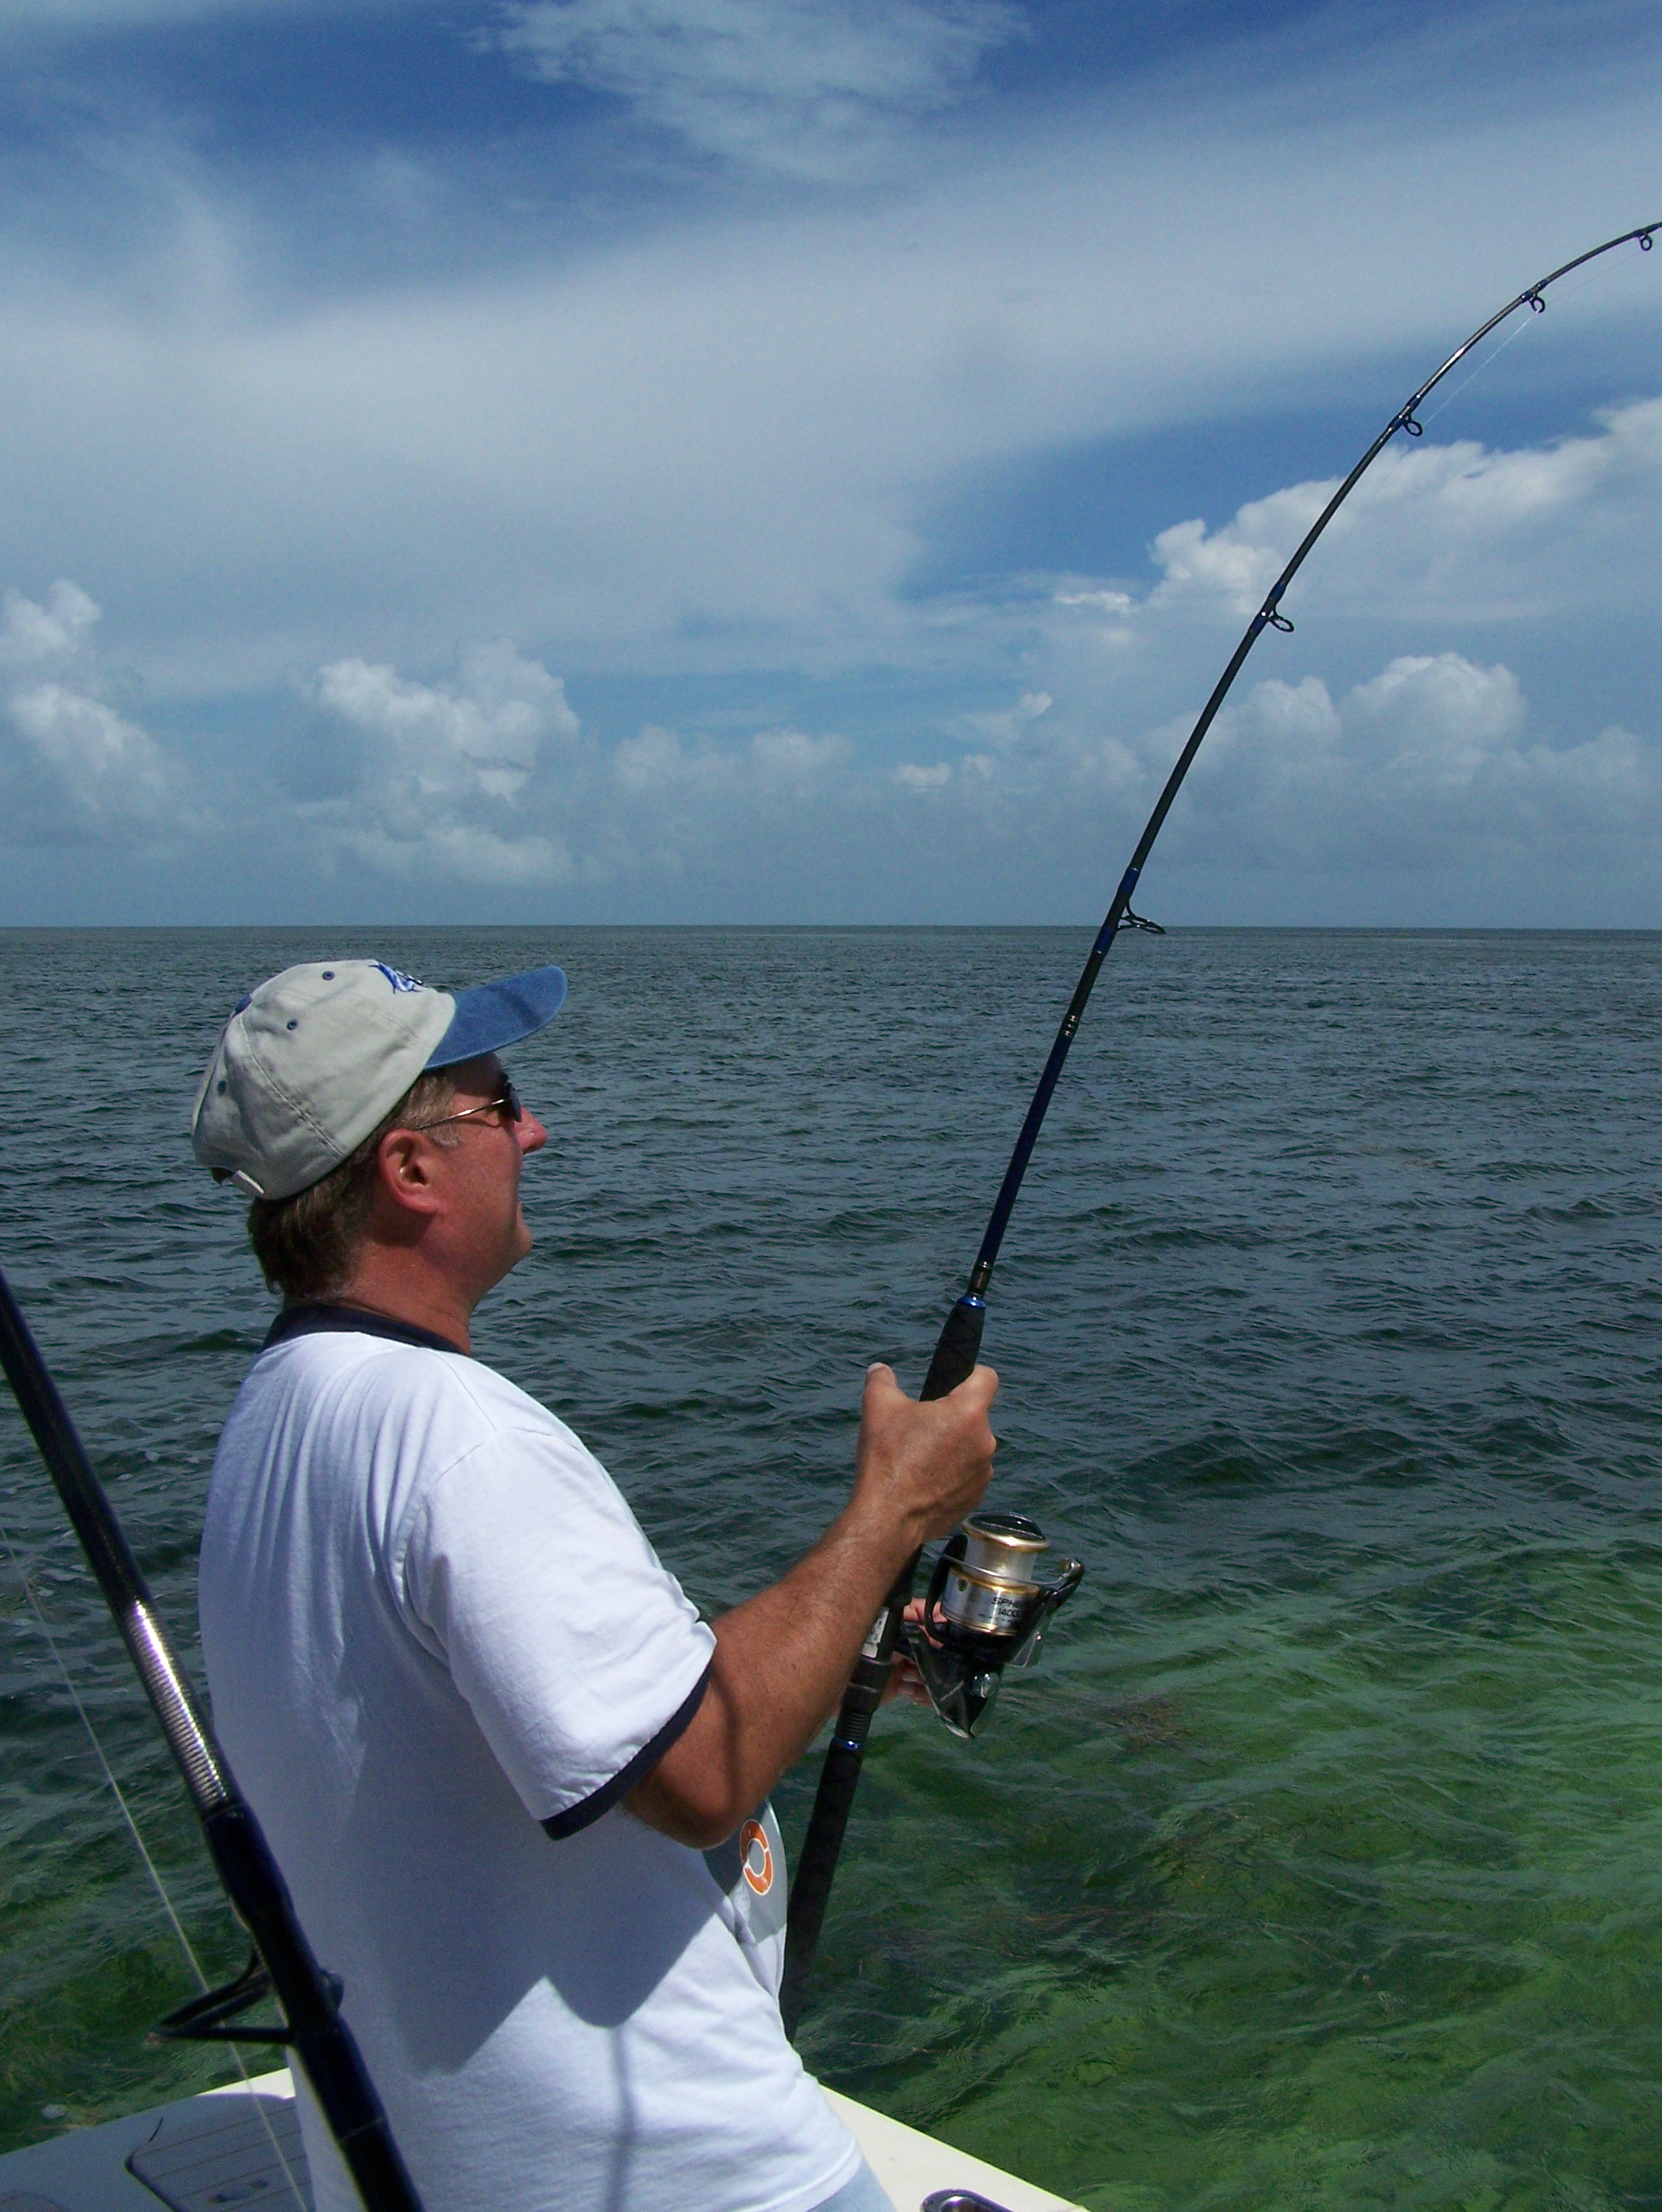 Florida keys grouper fishing seasquared charters part 6 for Fishing marathon fl